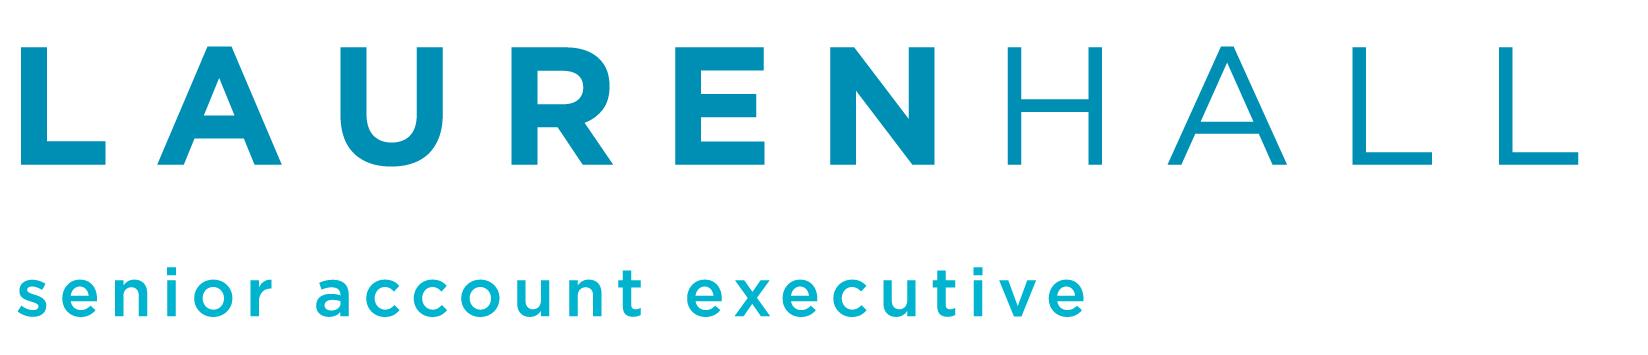 Lauren Hall | Senior Account Executive